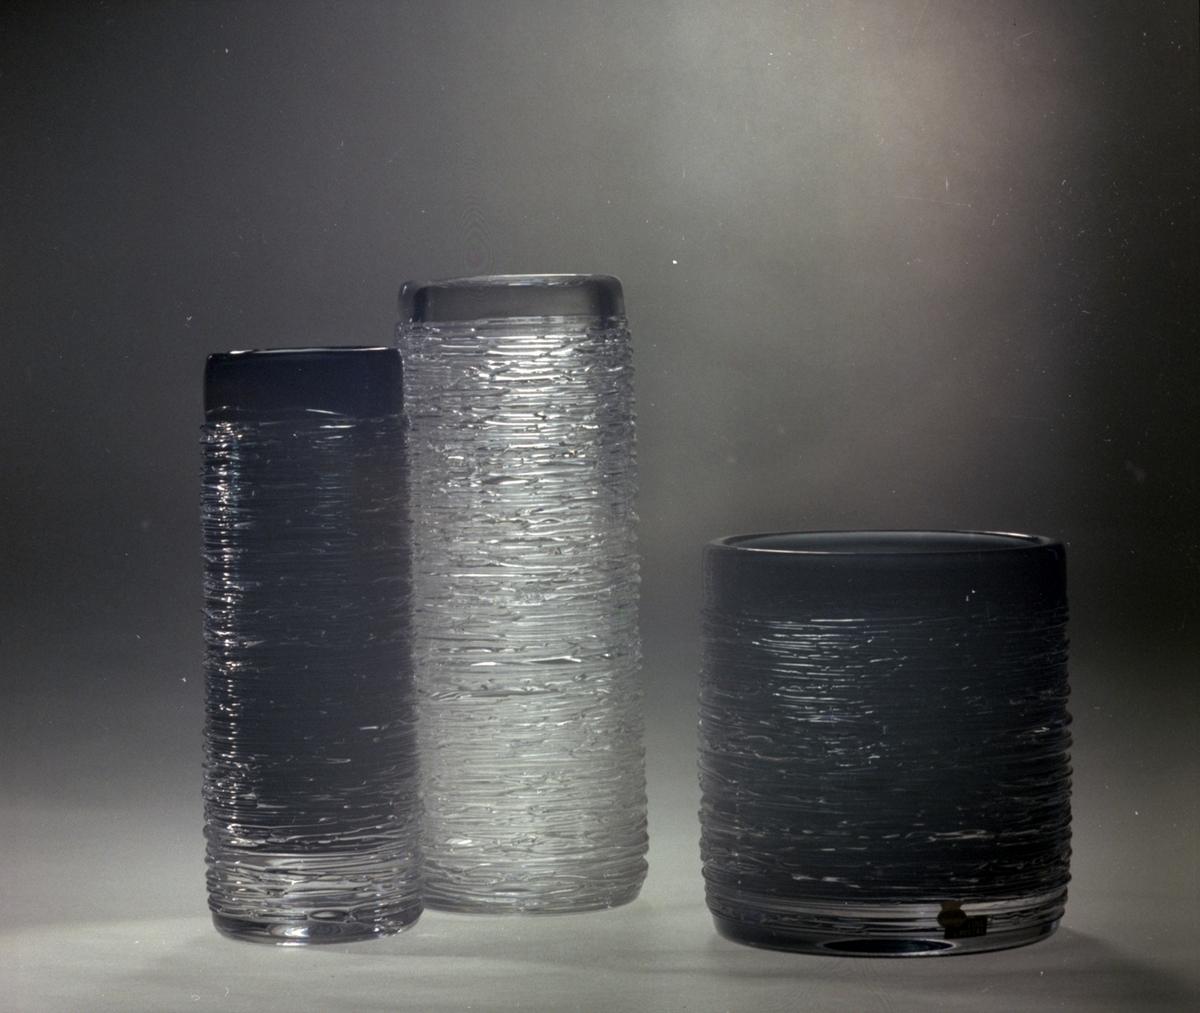 Vaser ifrån Skrufs Glasbruk AB.